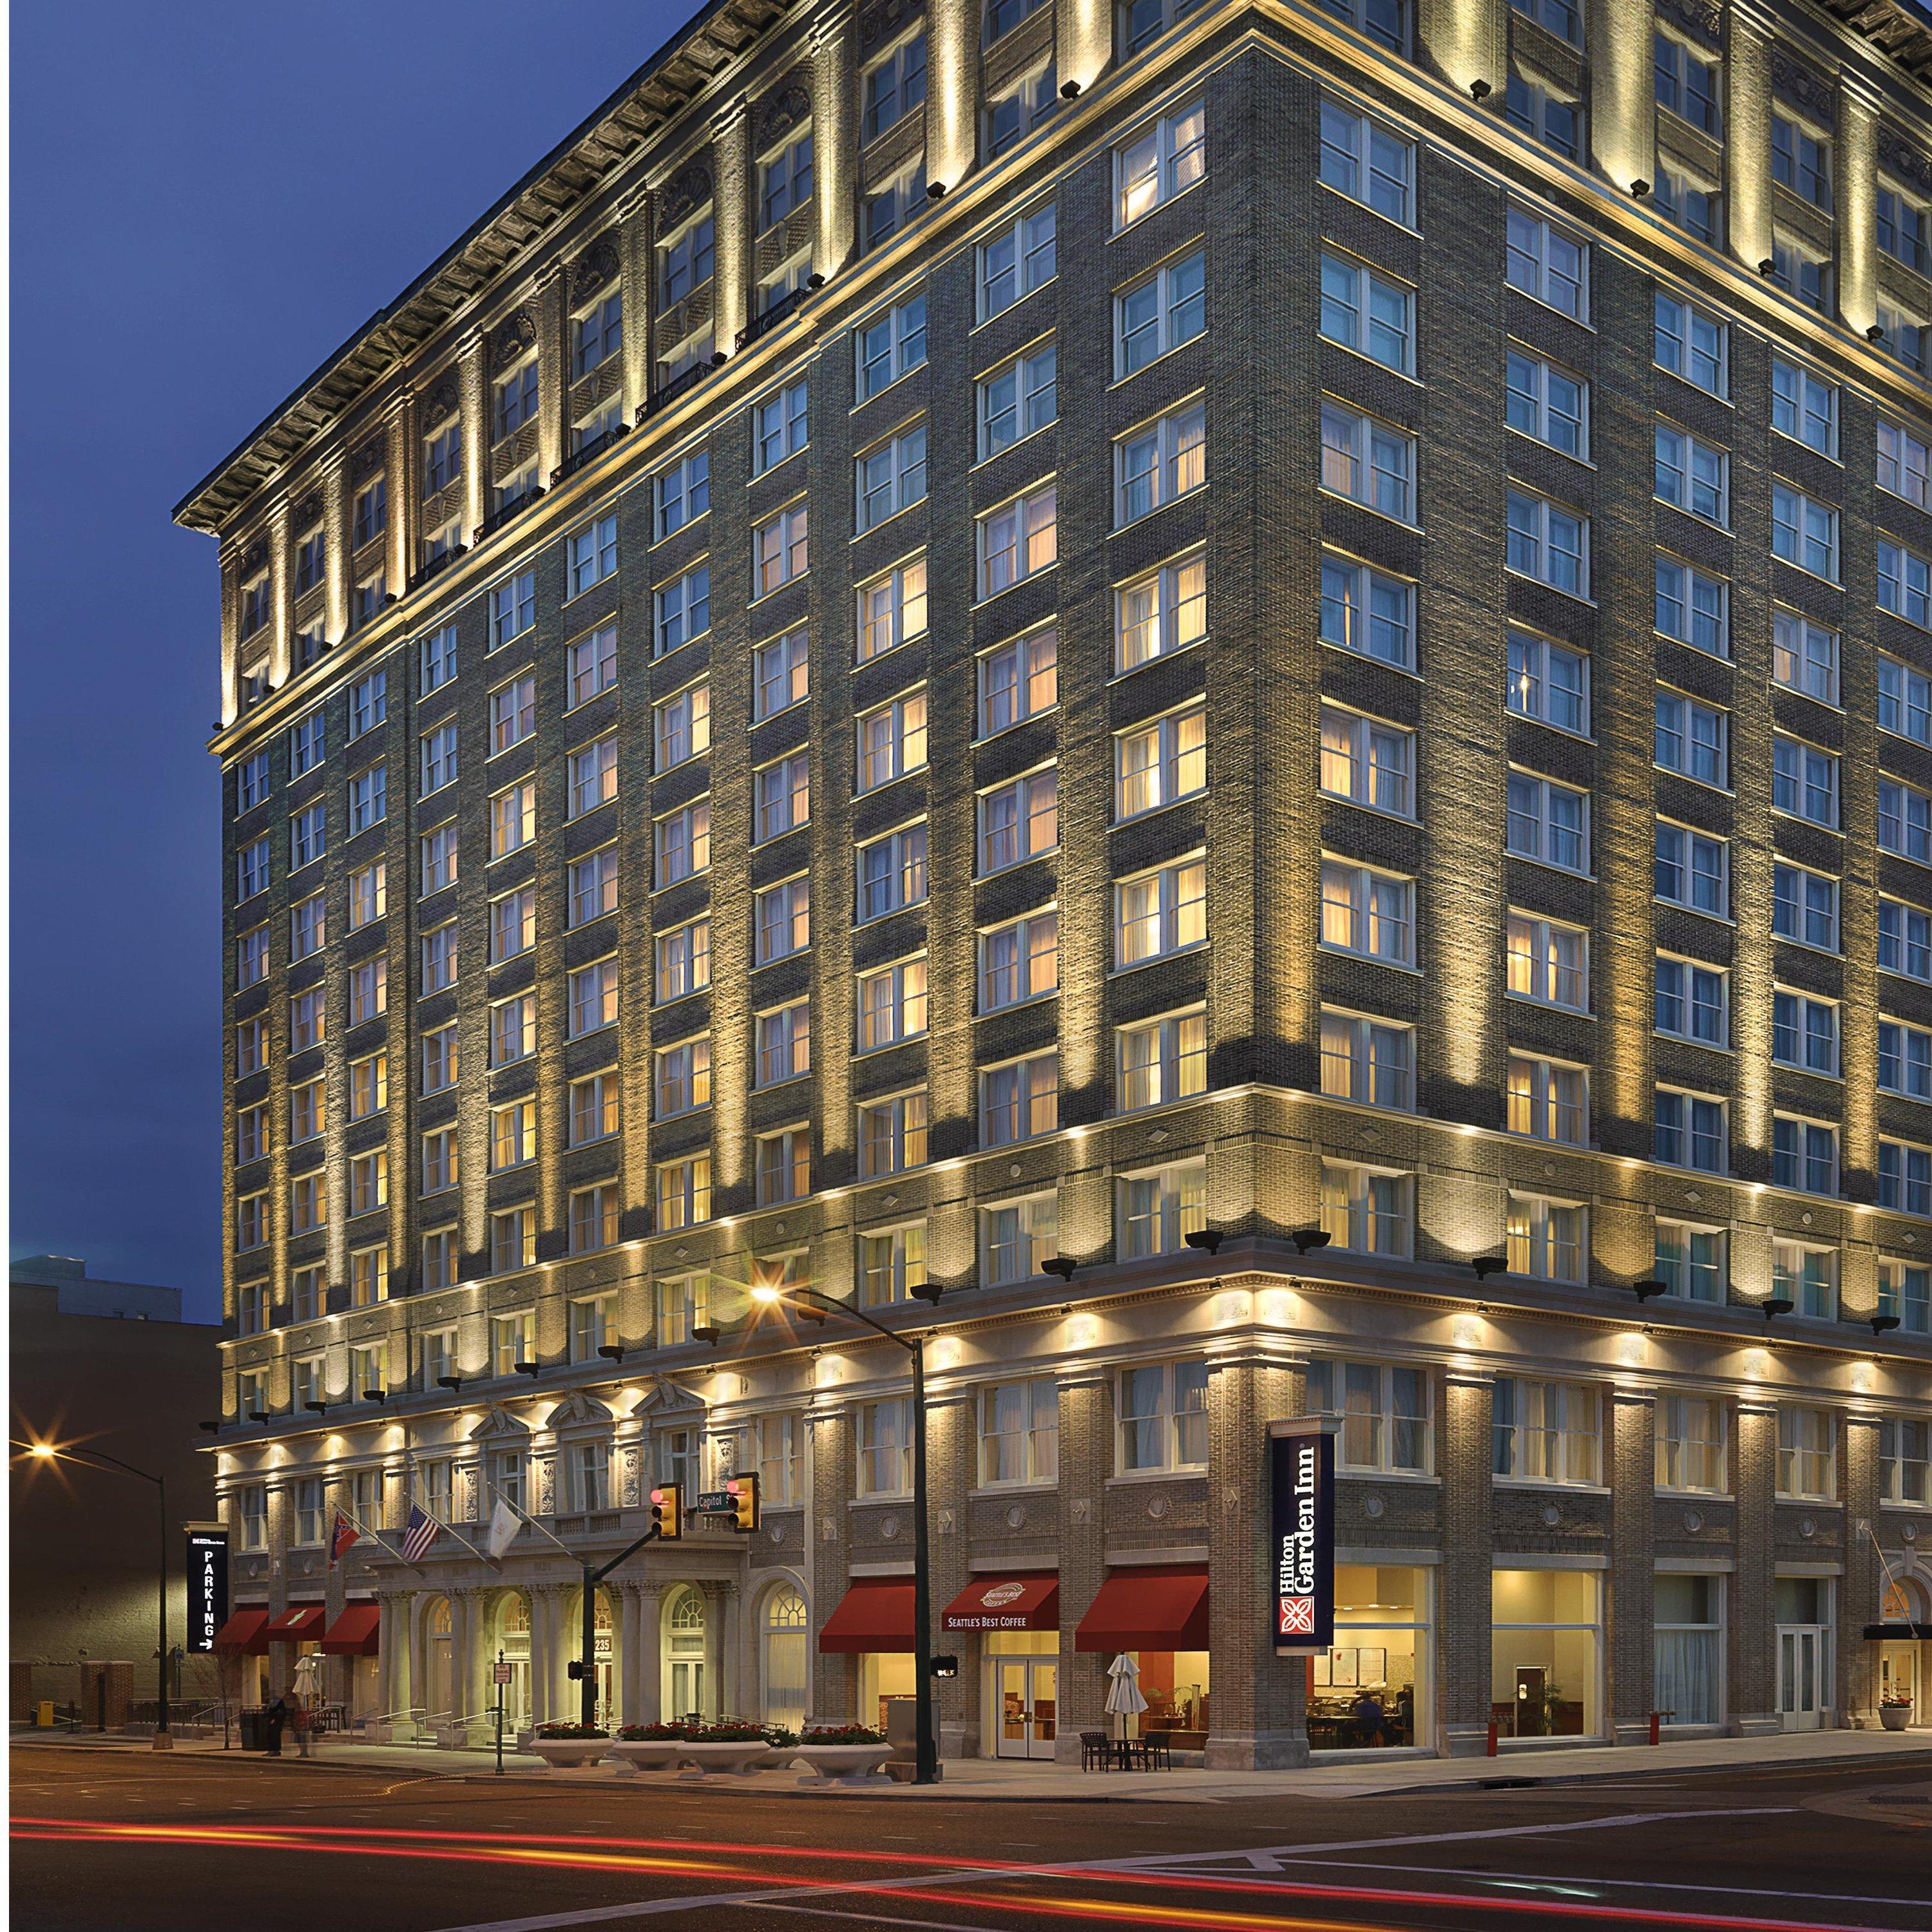 Hilton Garden Inn Jackson Downtown